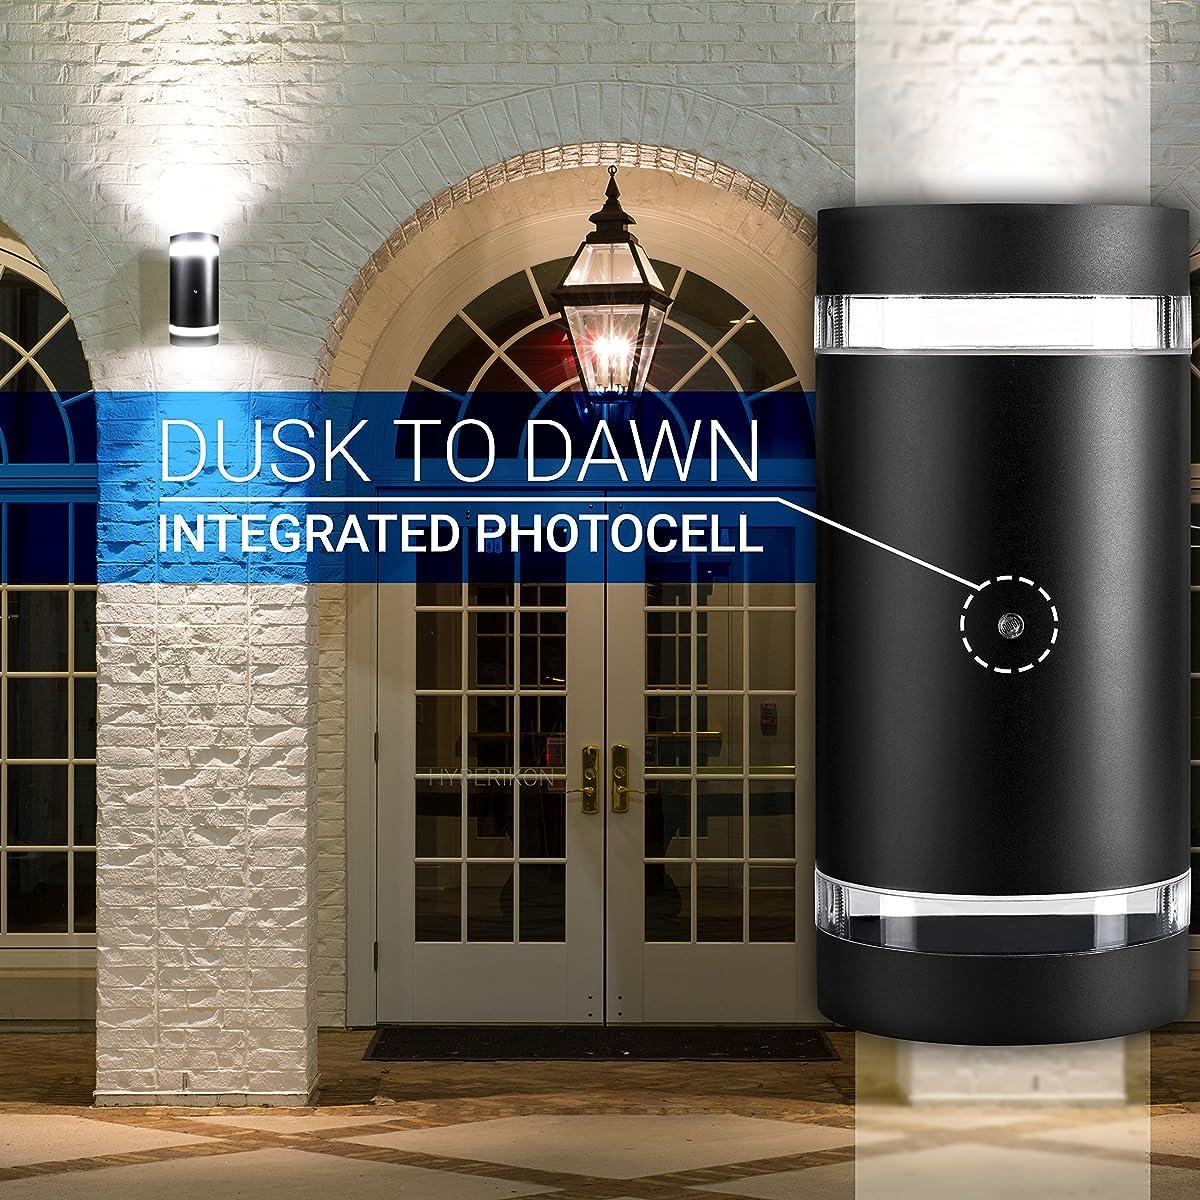 Hyperikon LED Porch Sconce Cylinder Light 12W Black Modern Wall Mount with